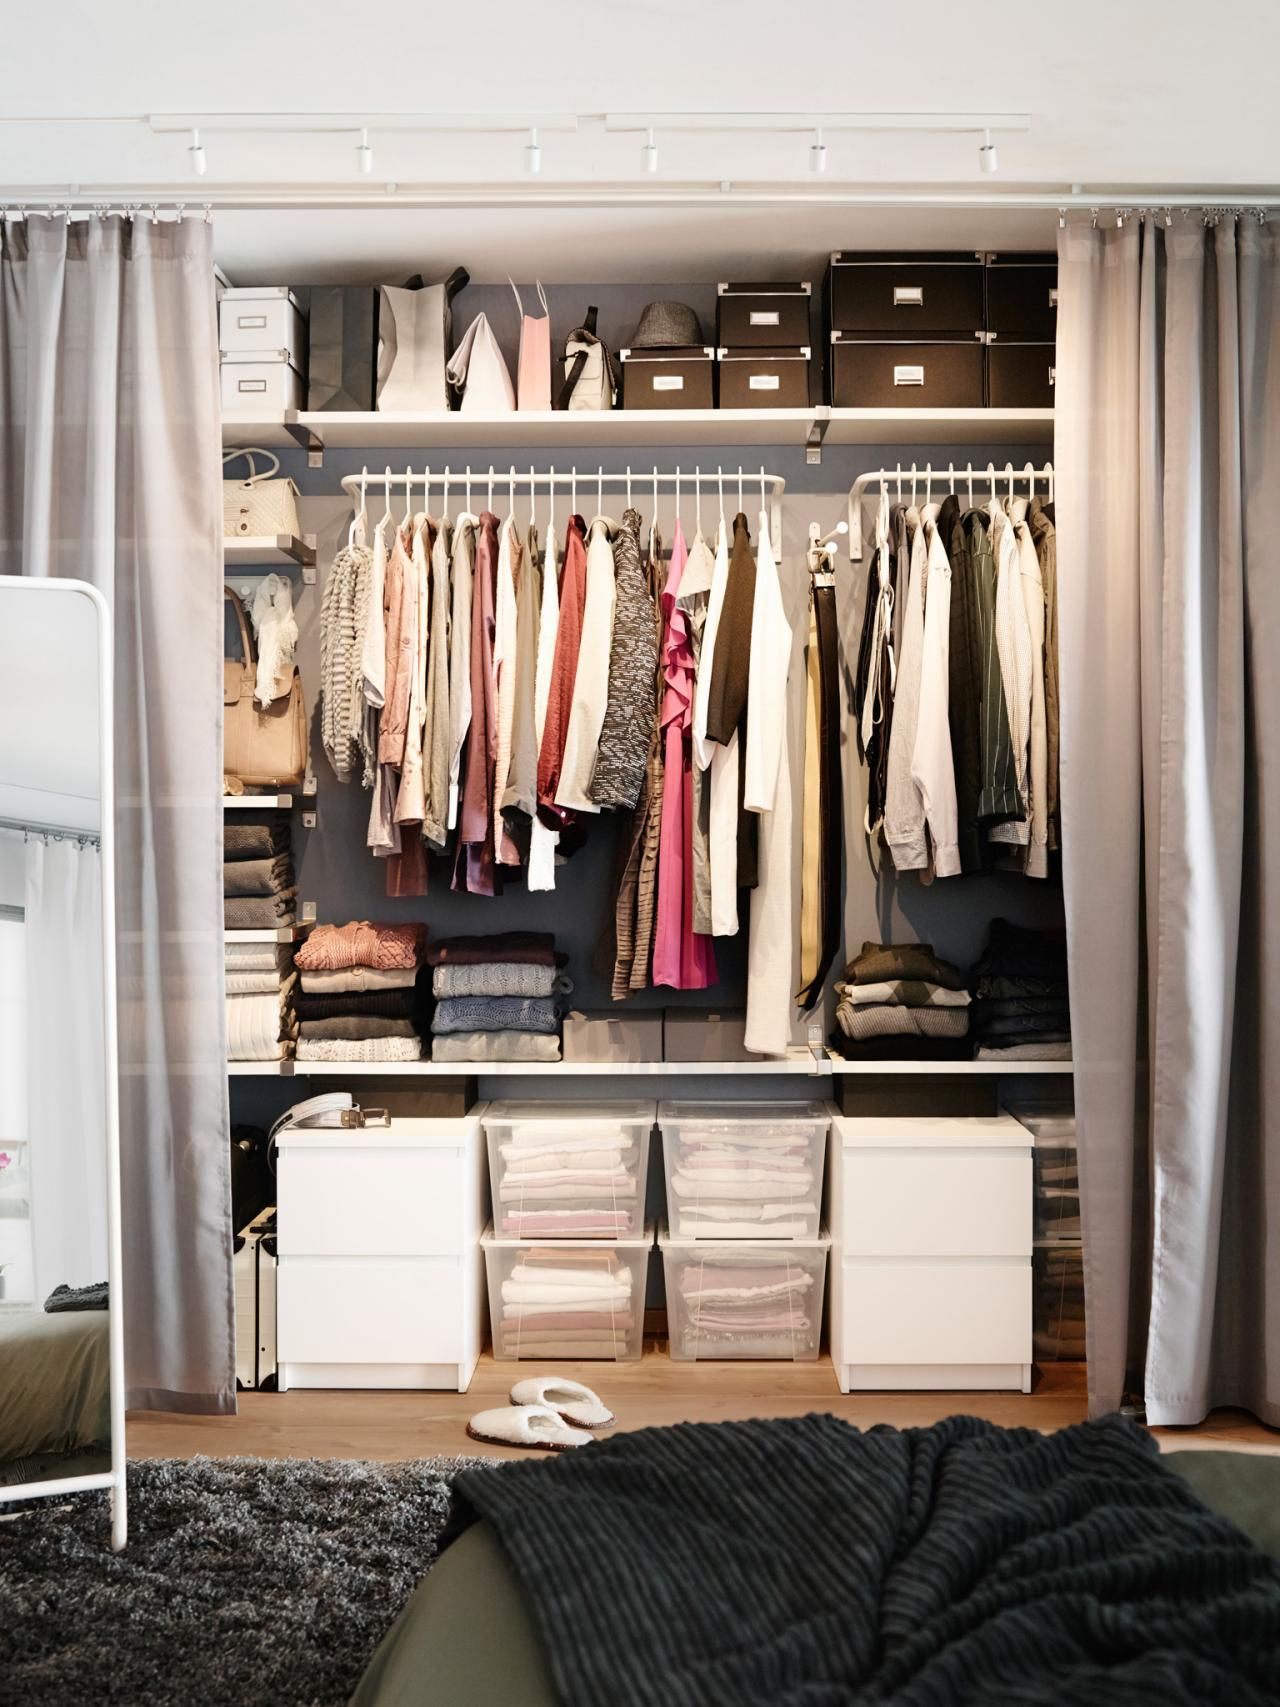 Small Space Decorating Don Ts Bedroom Organization Closet